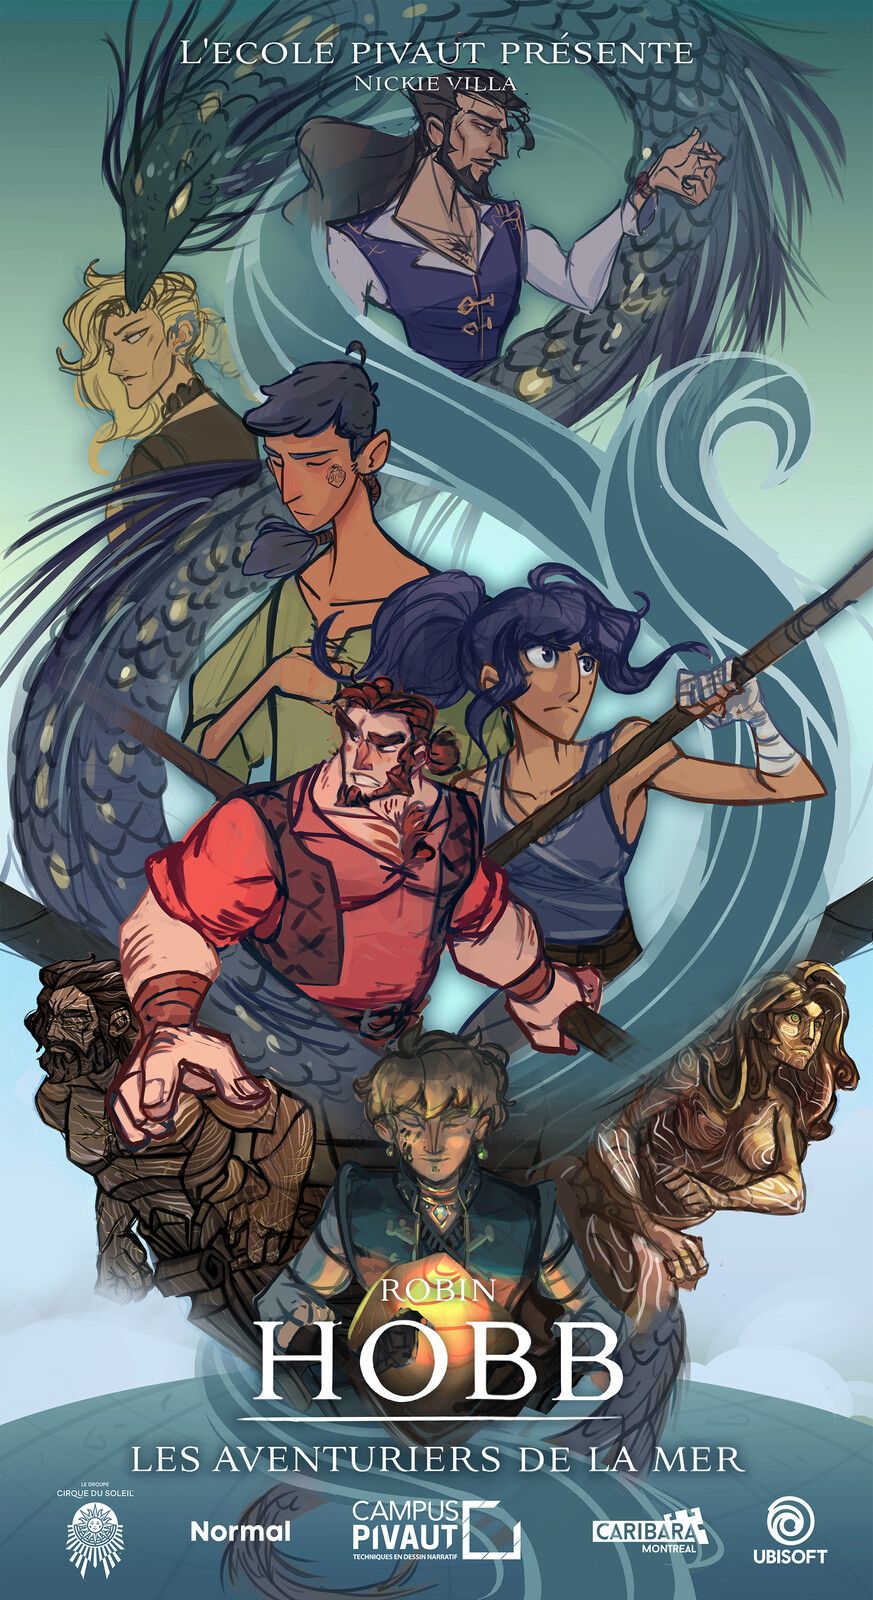 The cover/kakemono